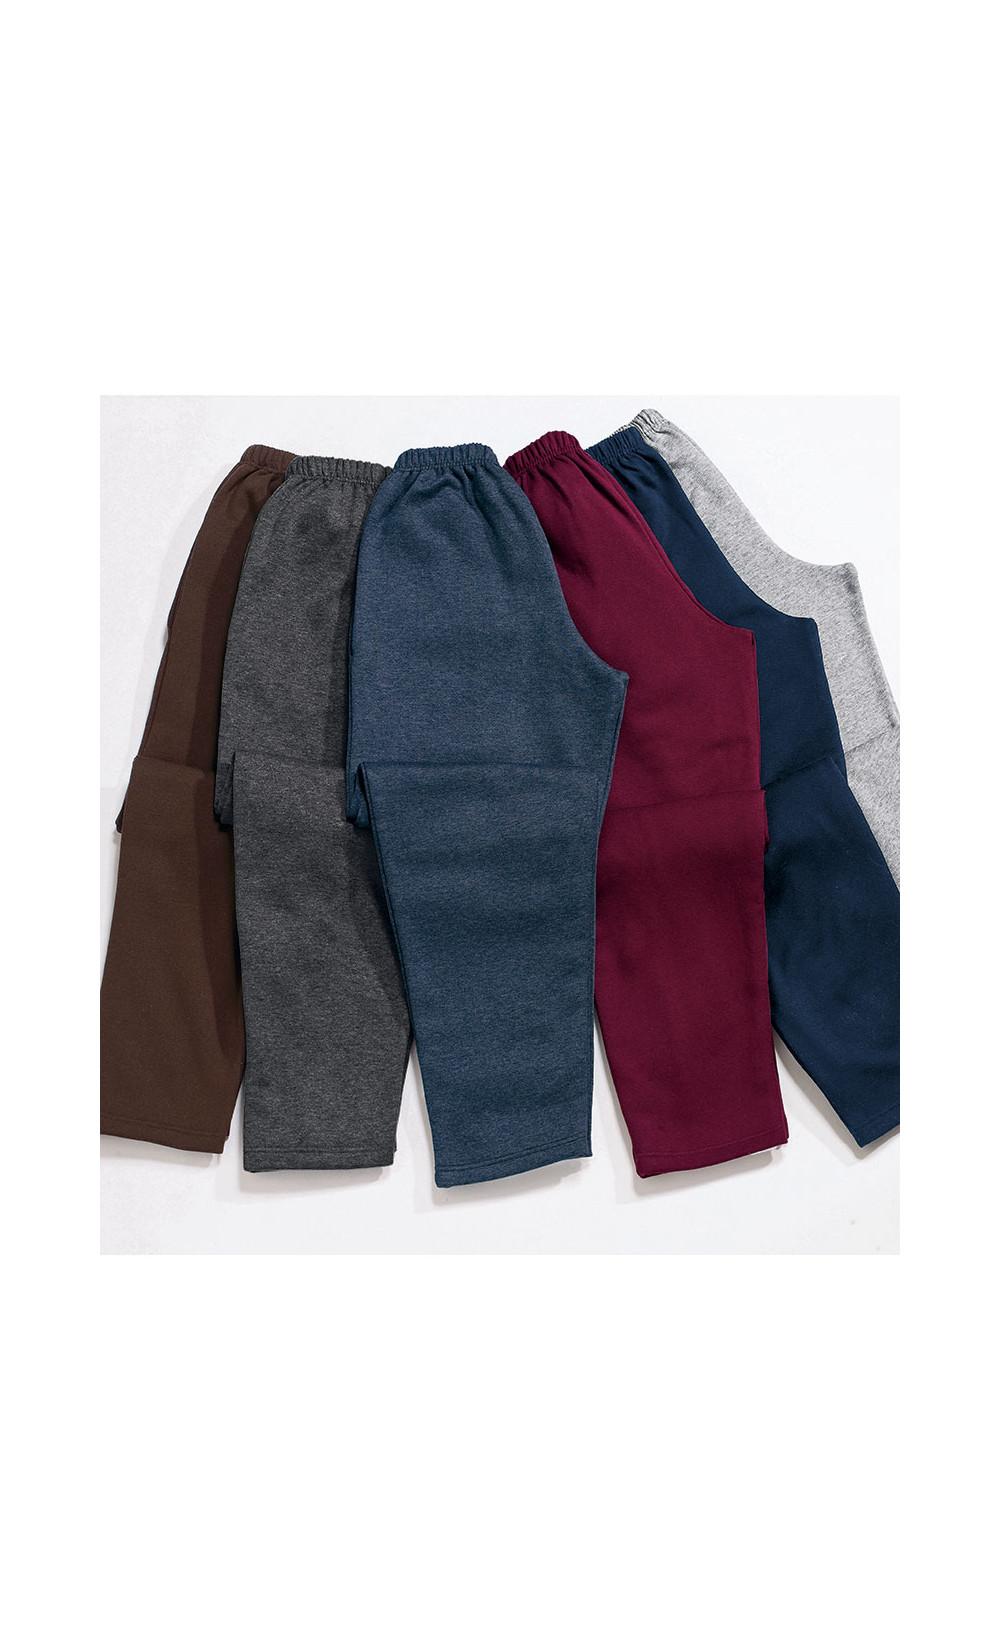 pantalon de jogging - FANO